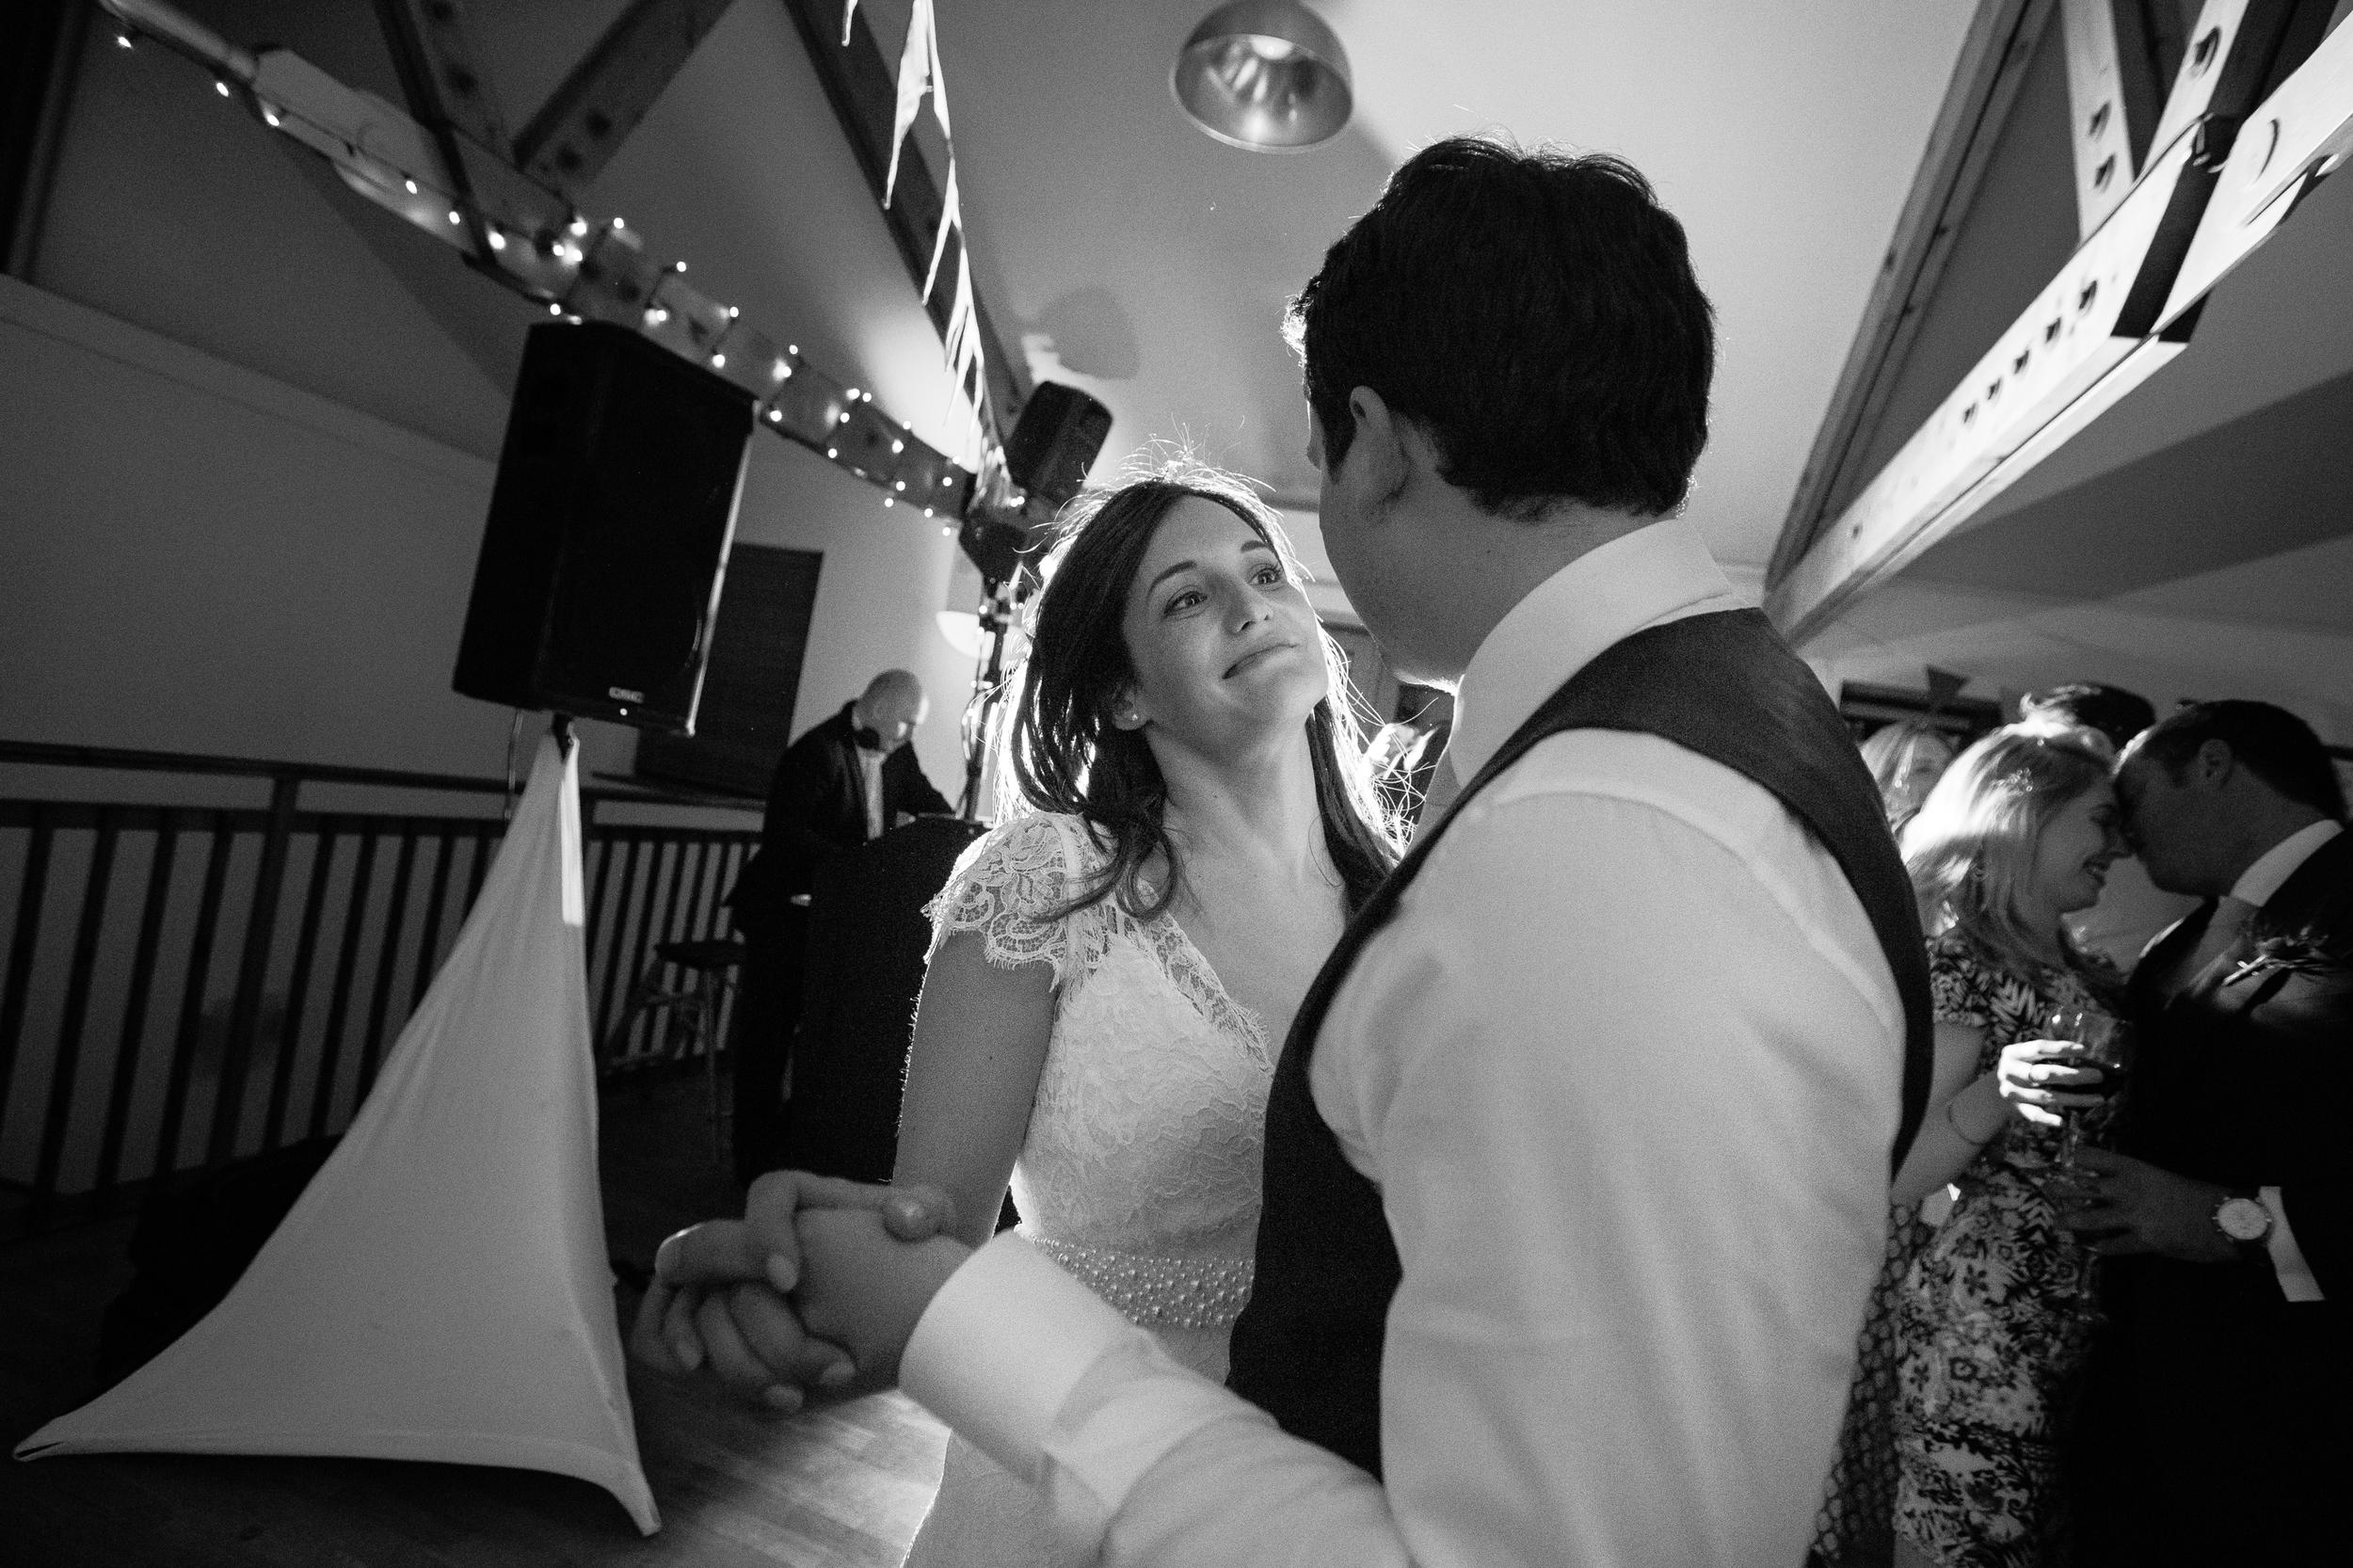 barnes-first-dance-reception-1-london-uk-destination-wedding-photography-Adam-Rowley